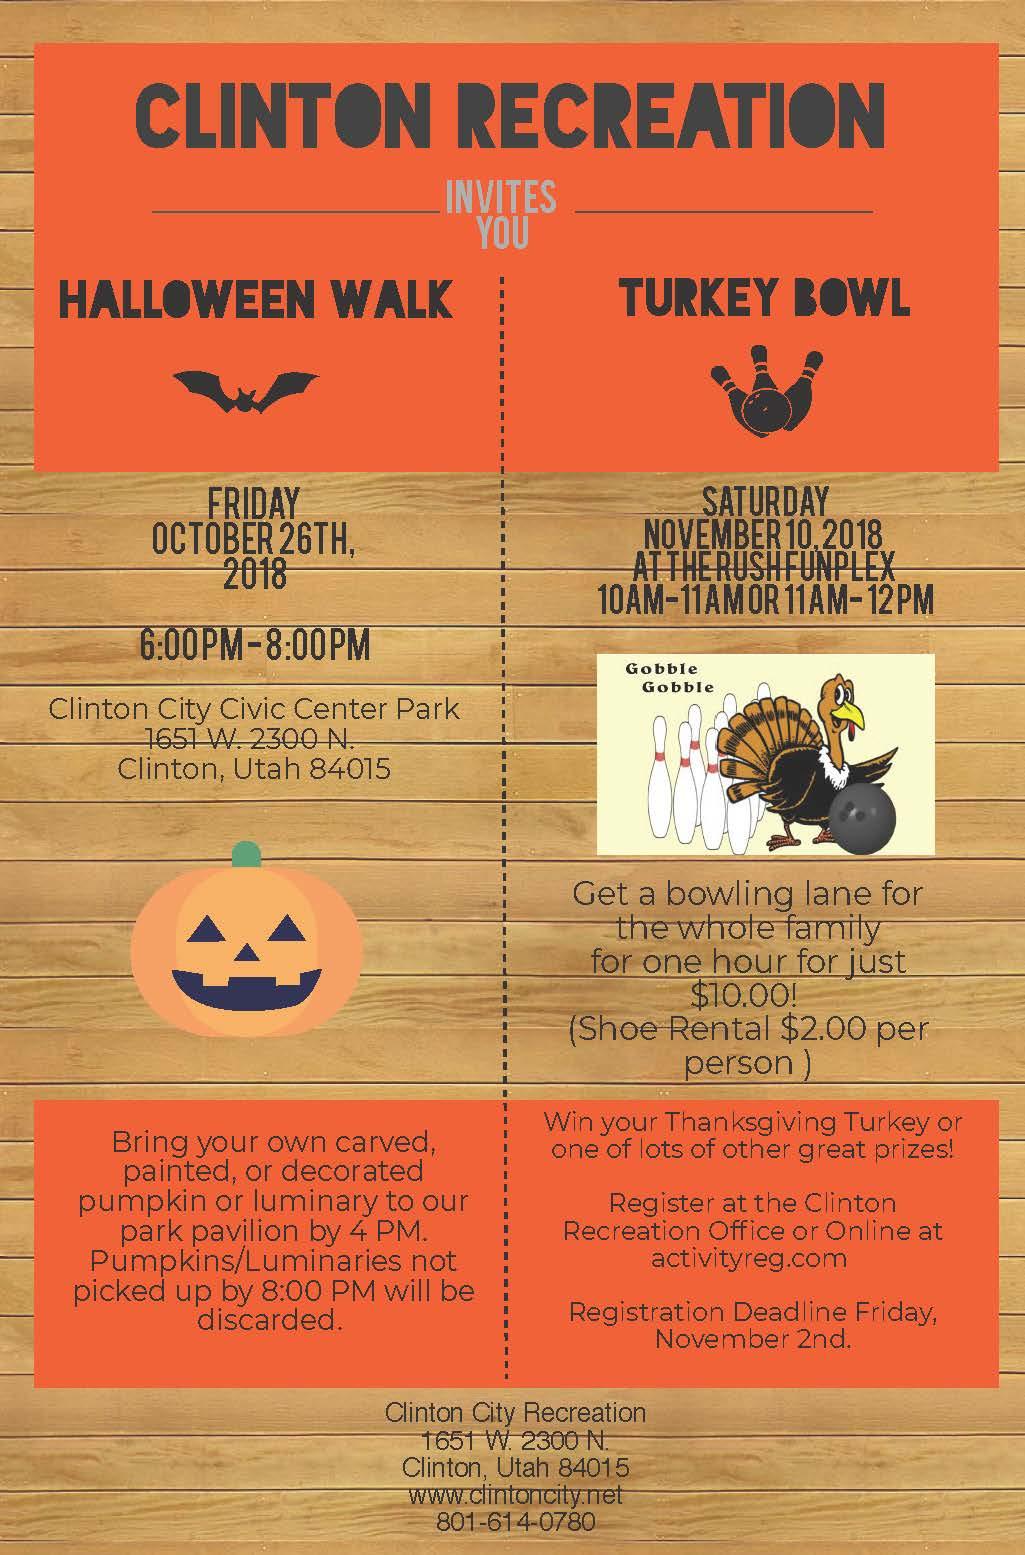 oct 26 2018 clinton recreation halloween walk